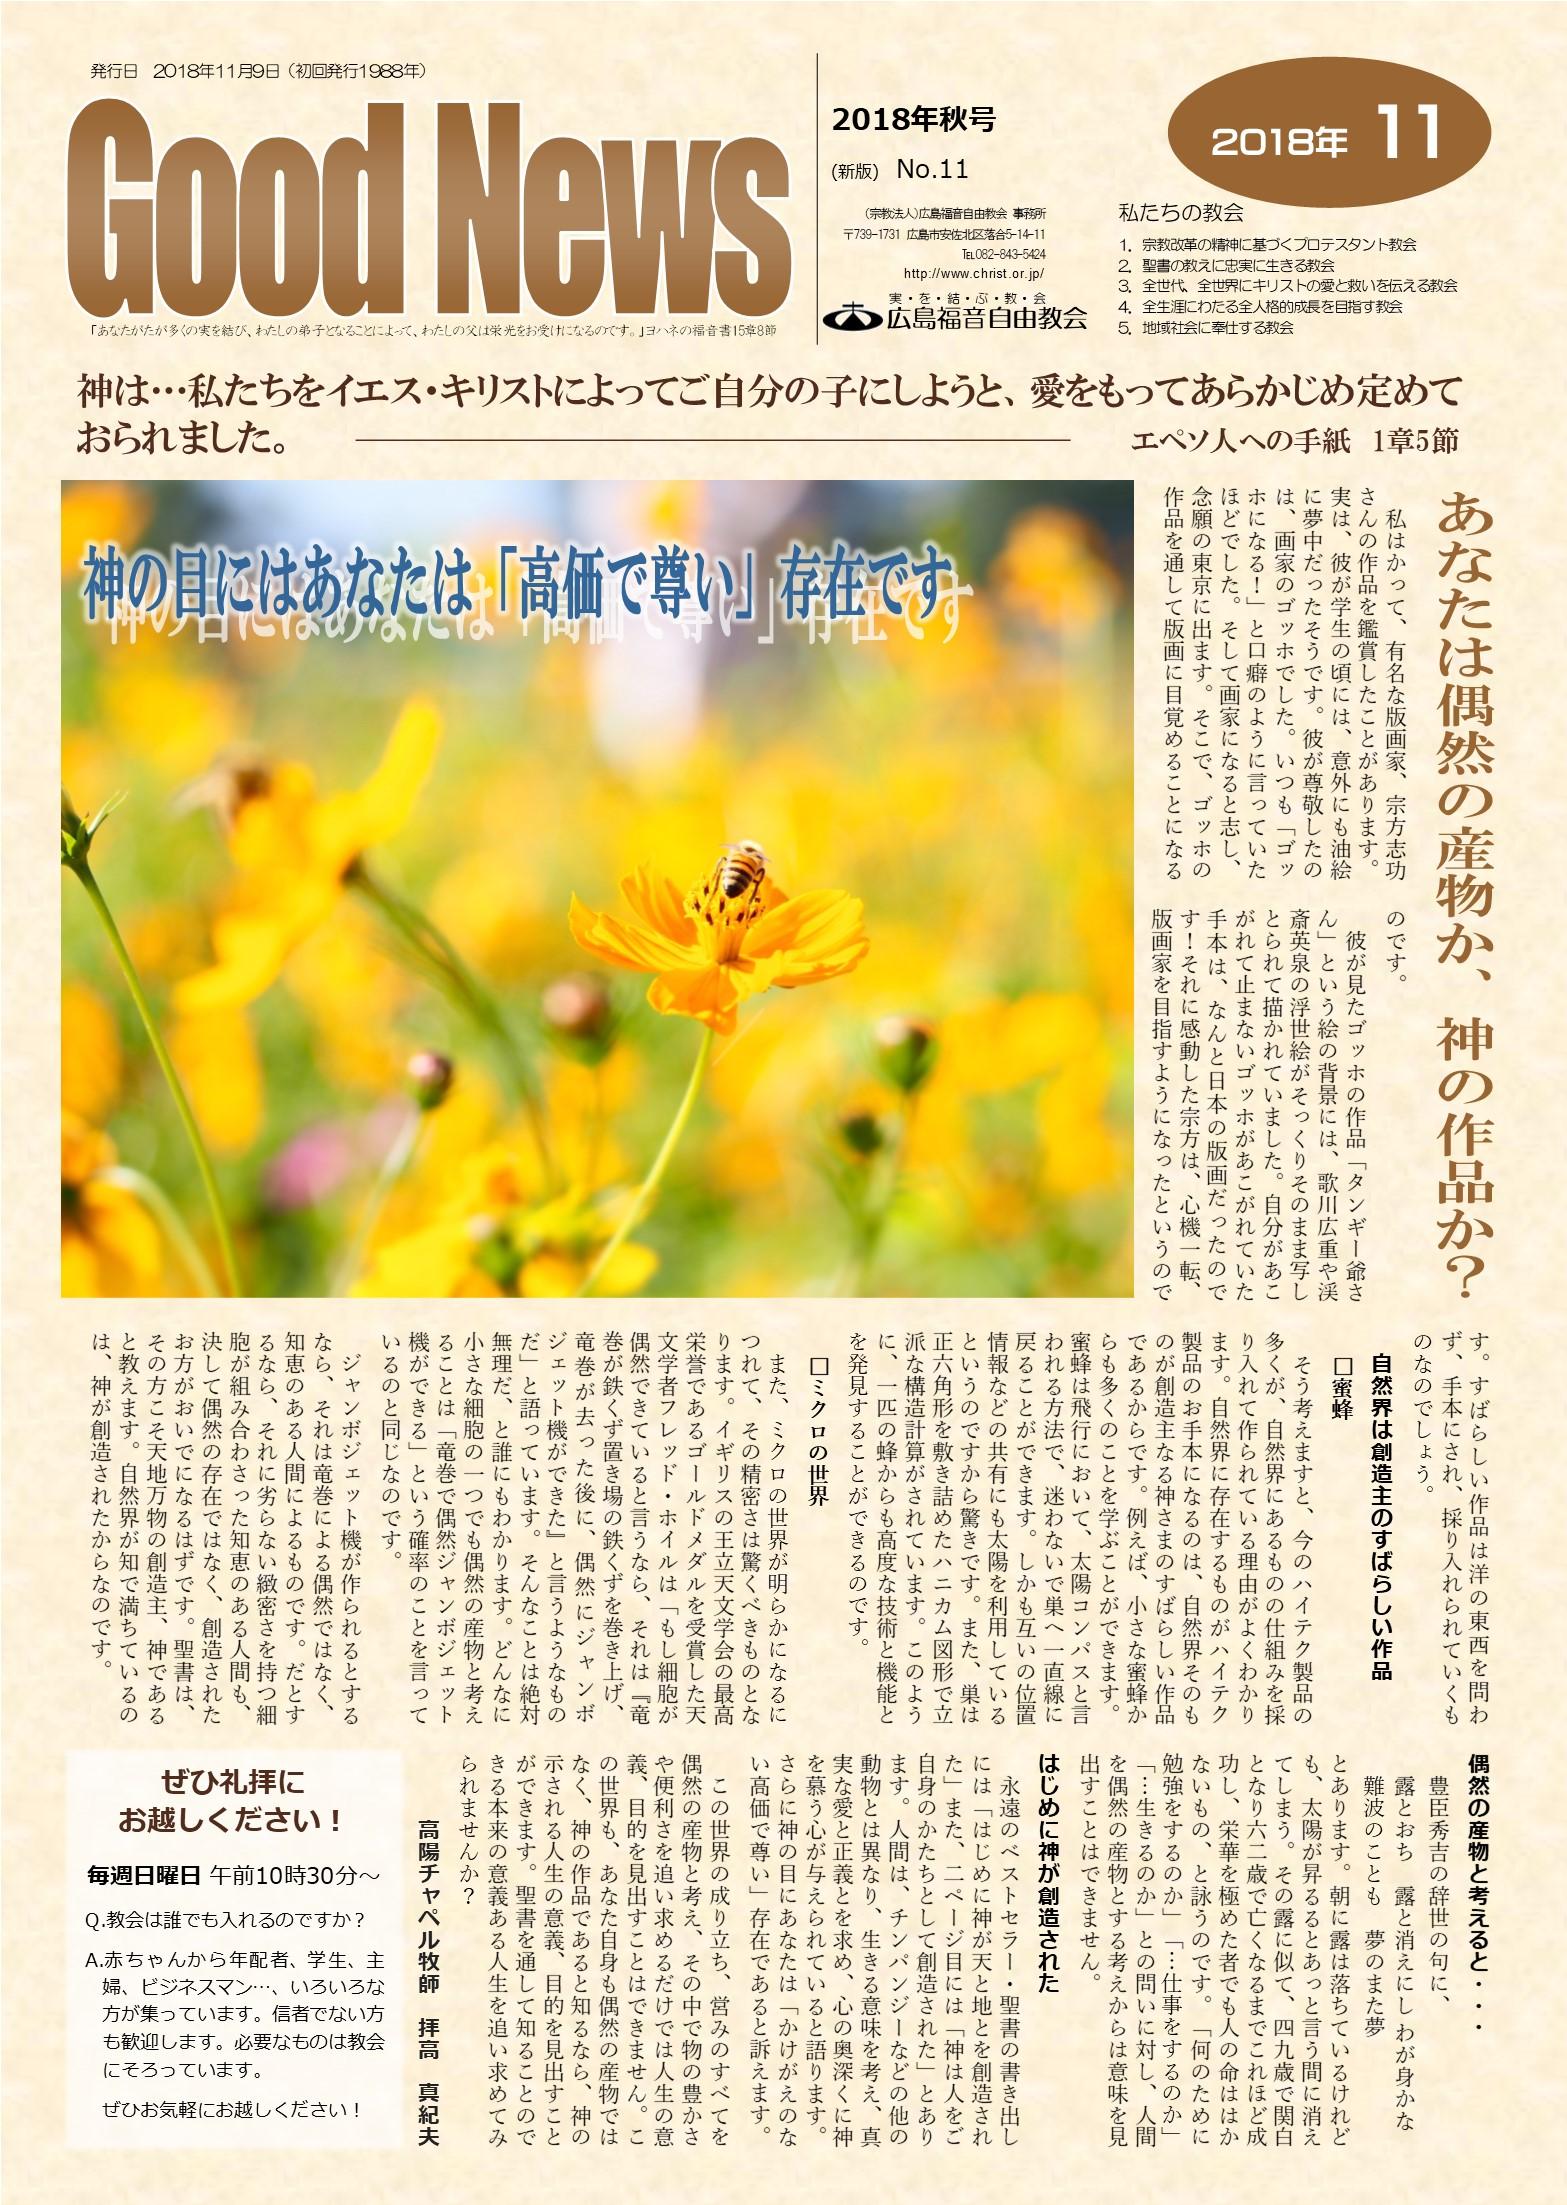 goodnews 教会新聞 教会紹介 広島福音自由教会